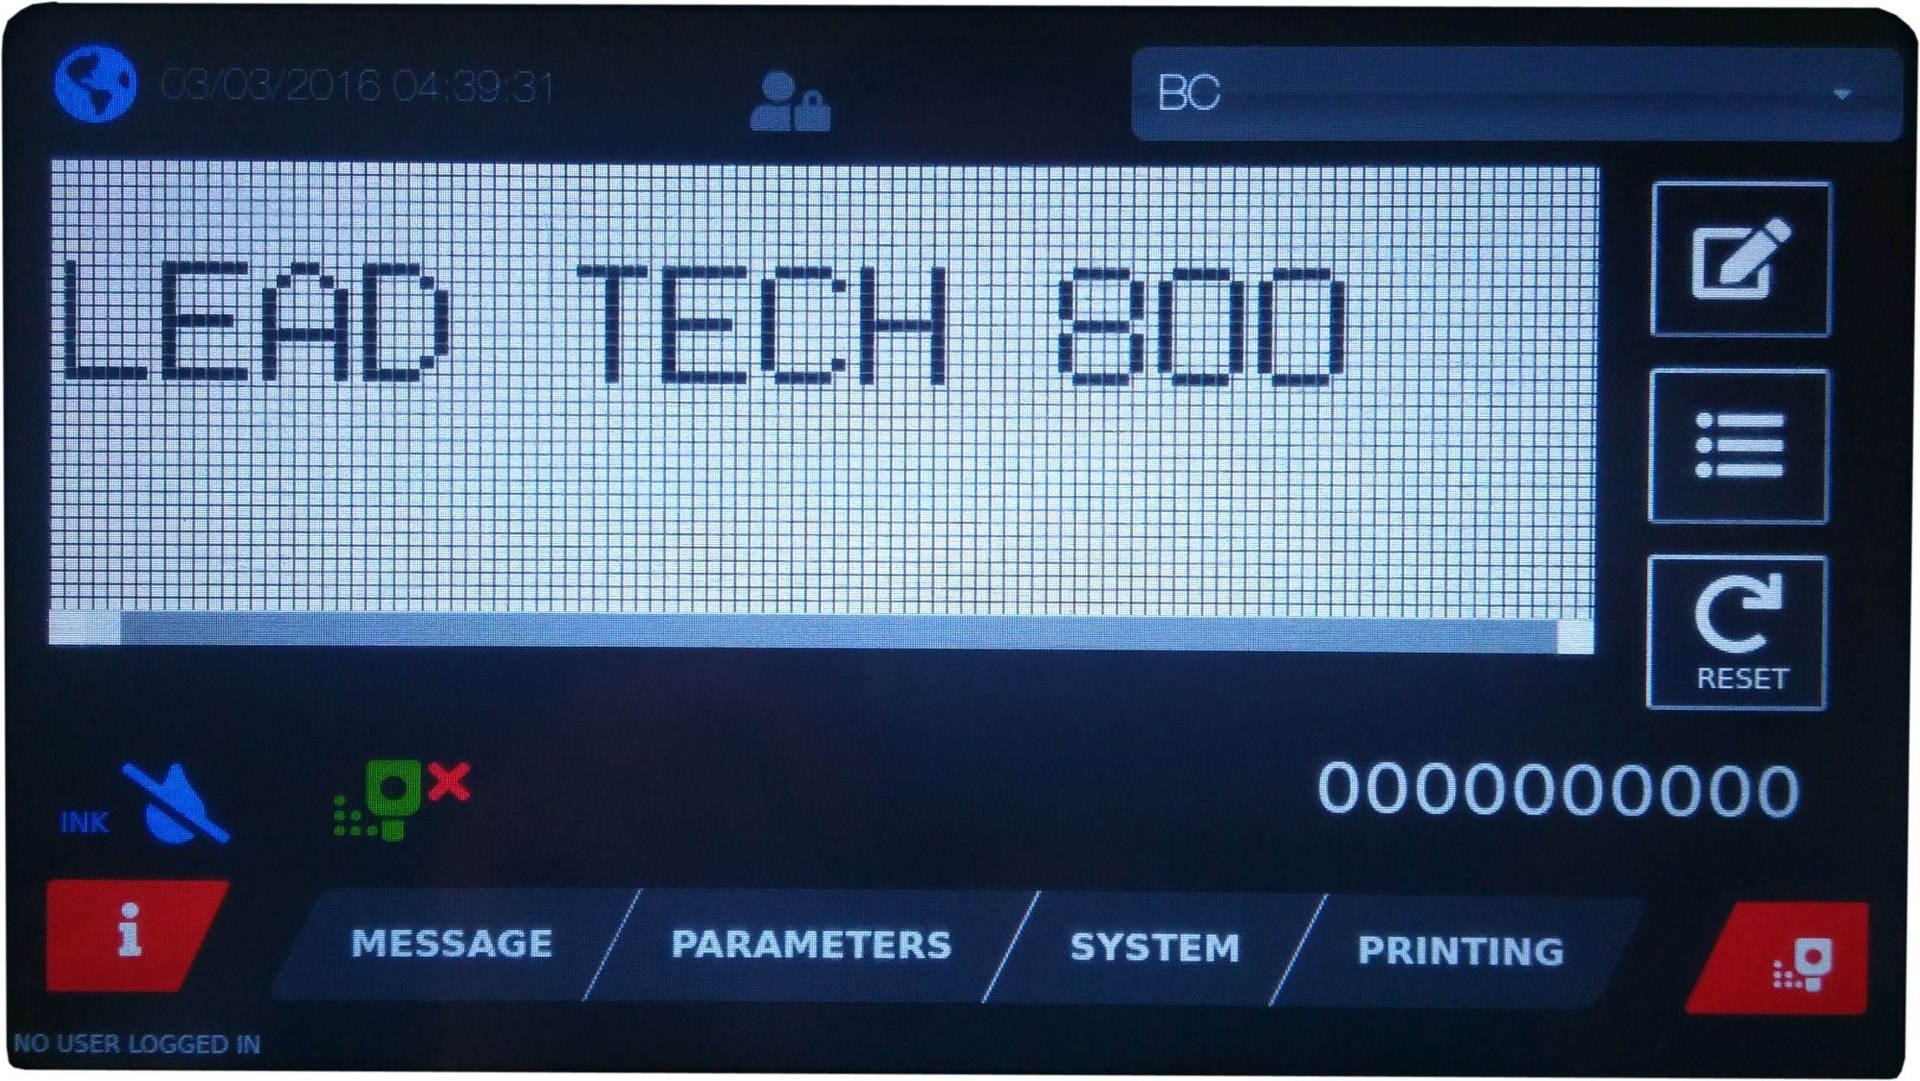 Lead Tech Lt800 Plastic Bottle Cij Coding Machine